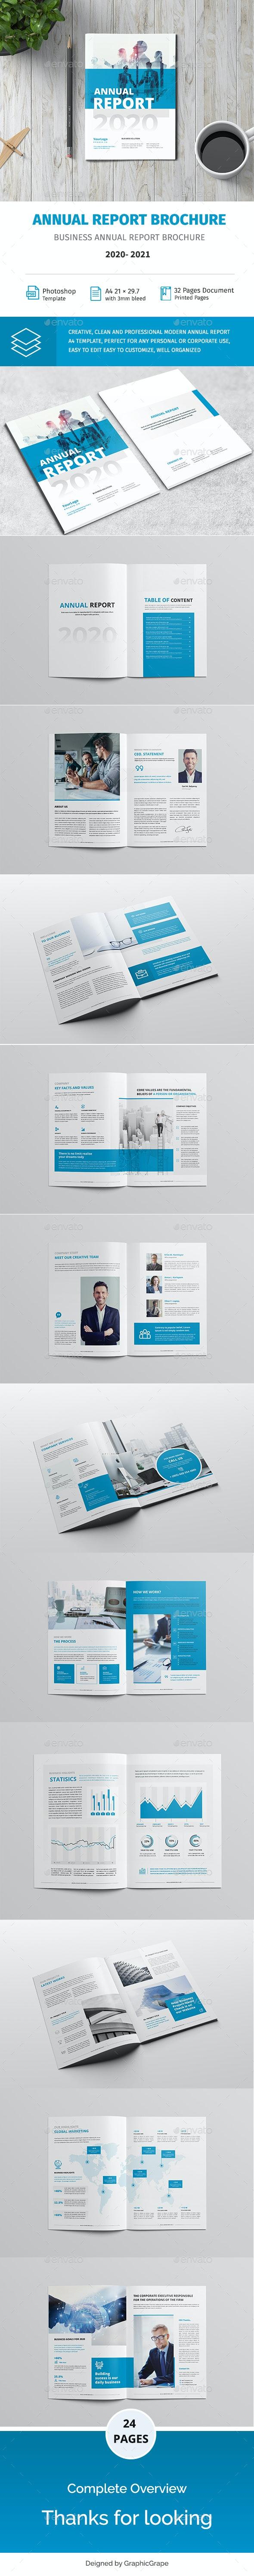 Annual Report Brochure - Corporate Brochures